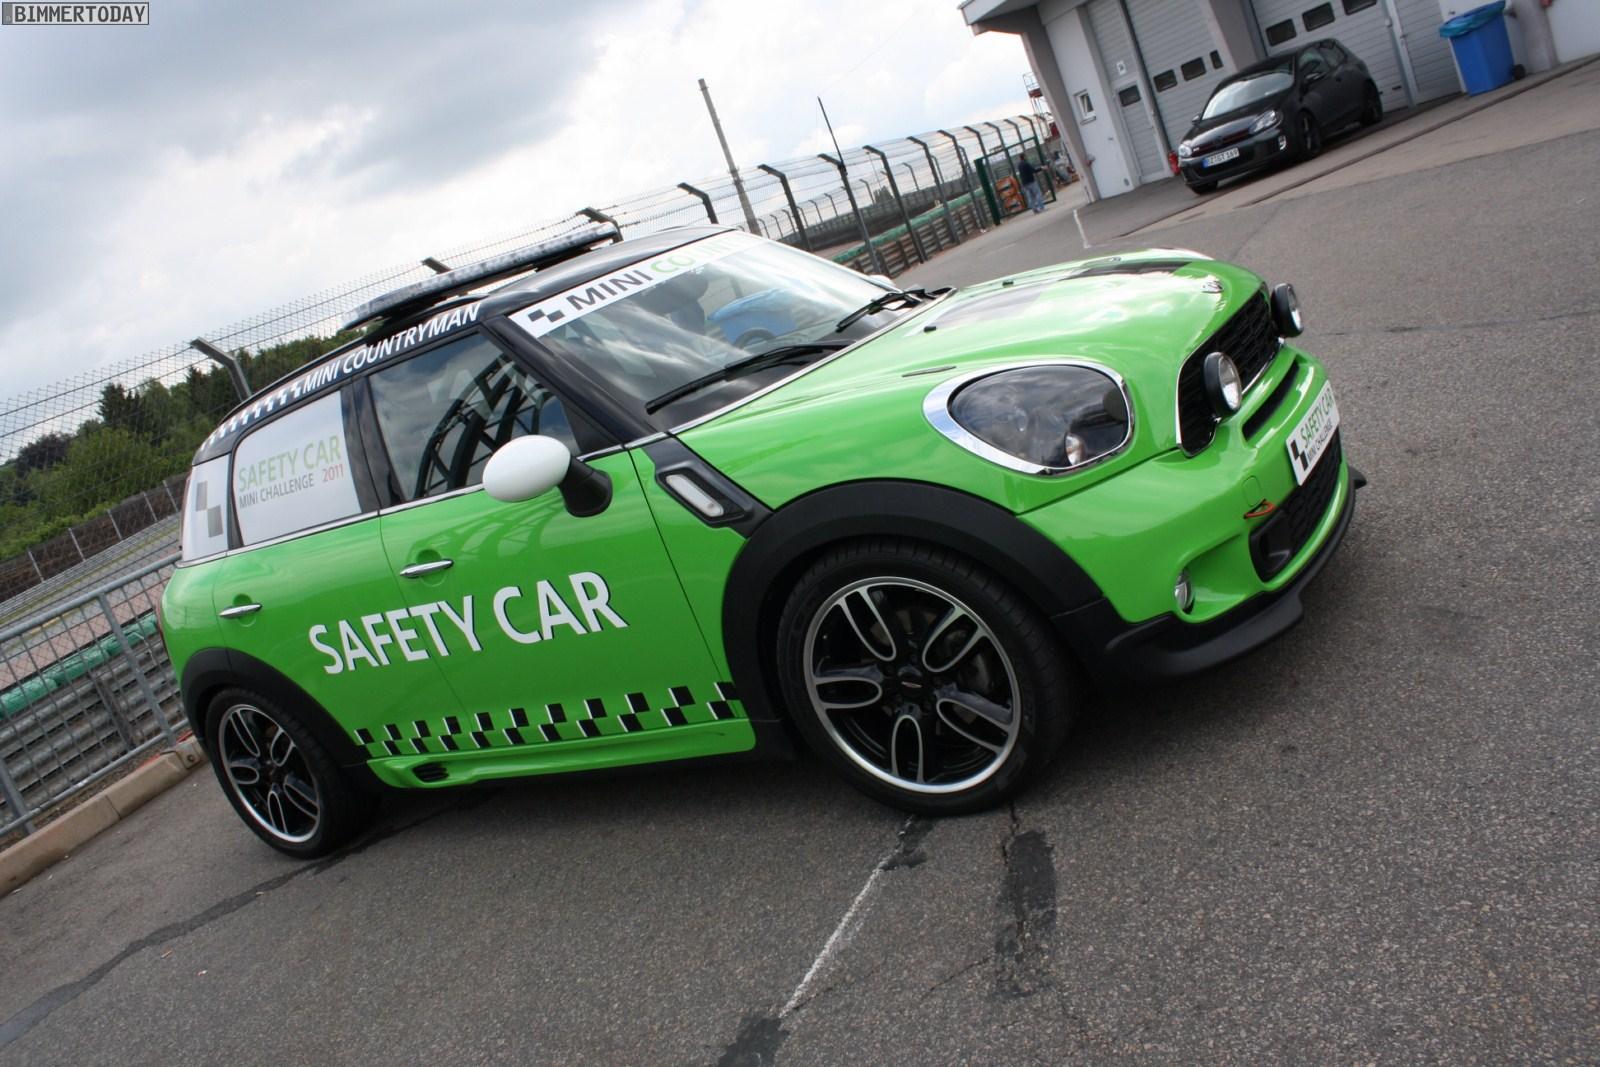 MINI Countryman Motoring: PHOTO :: MINI Countryman Safety Car